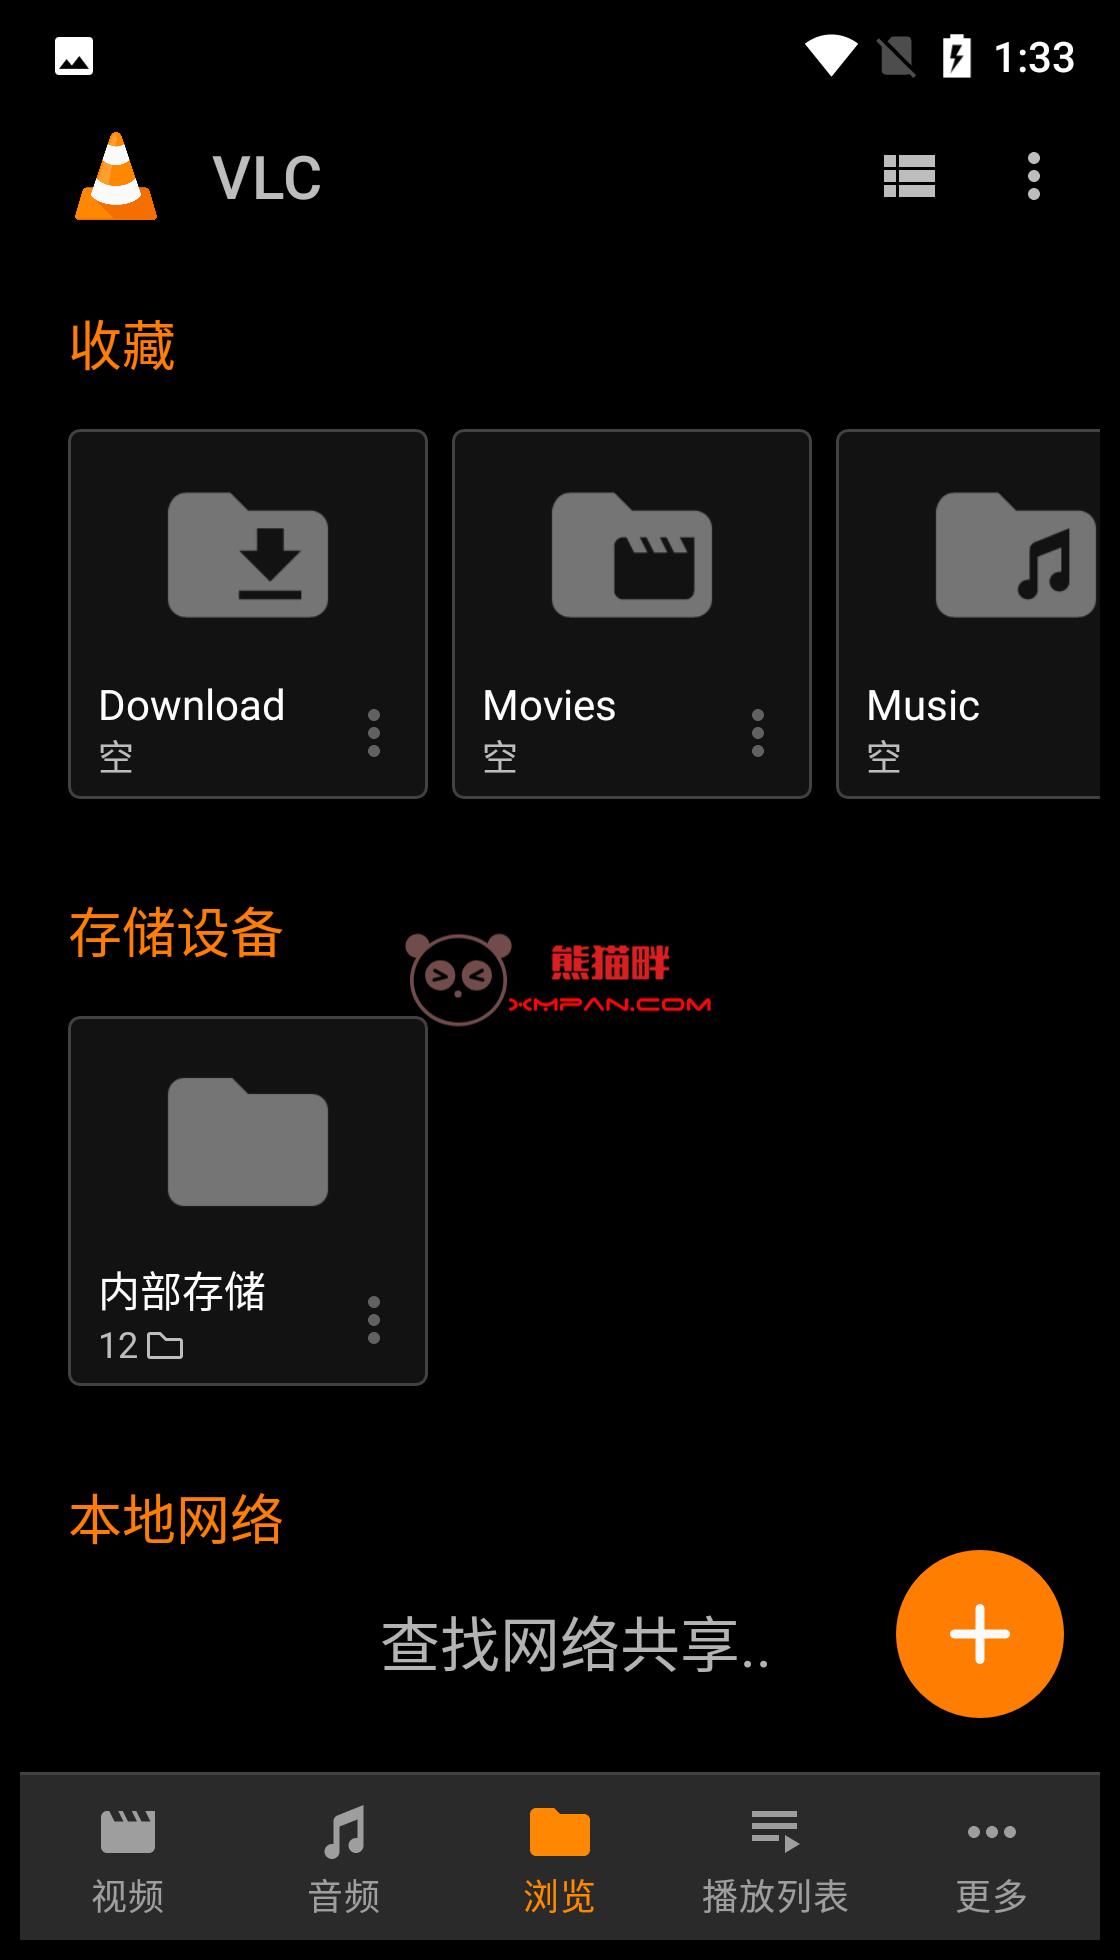 Screenshot_20211013-013329.png